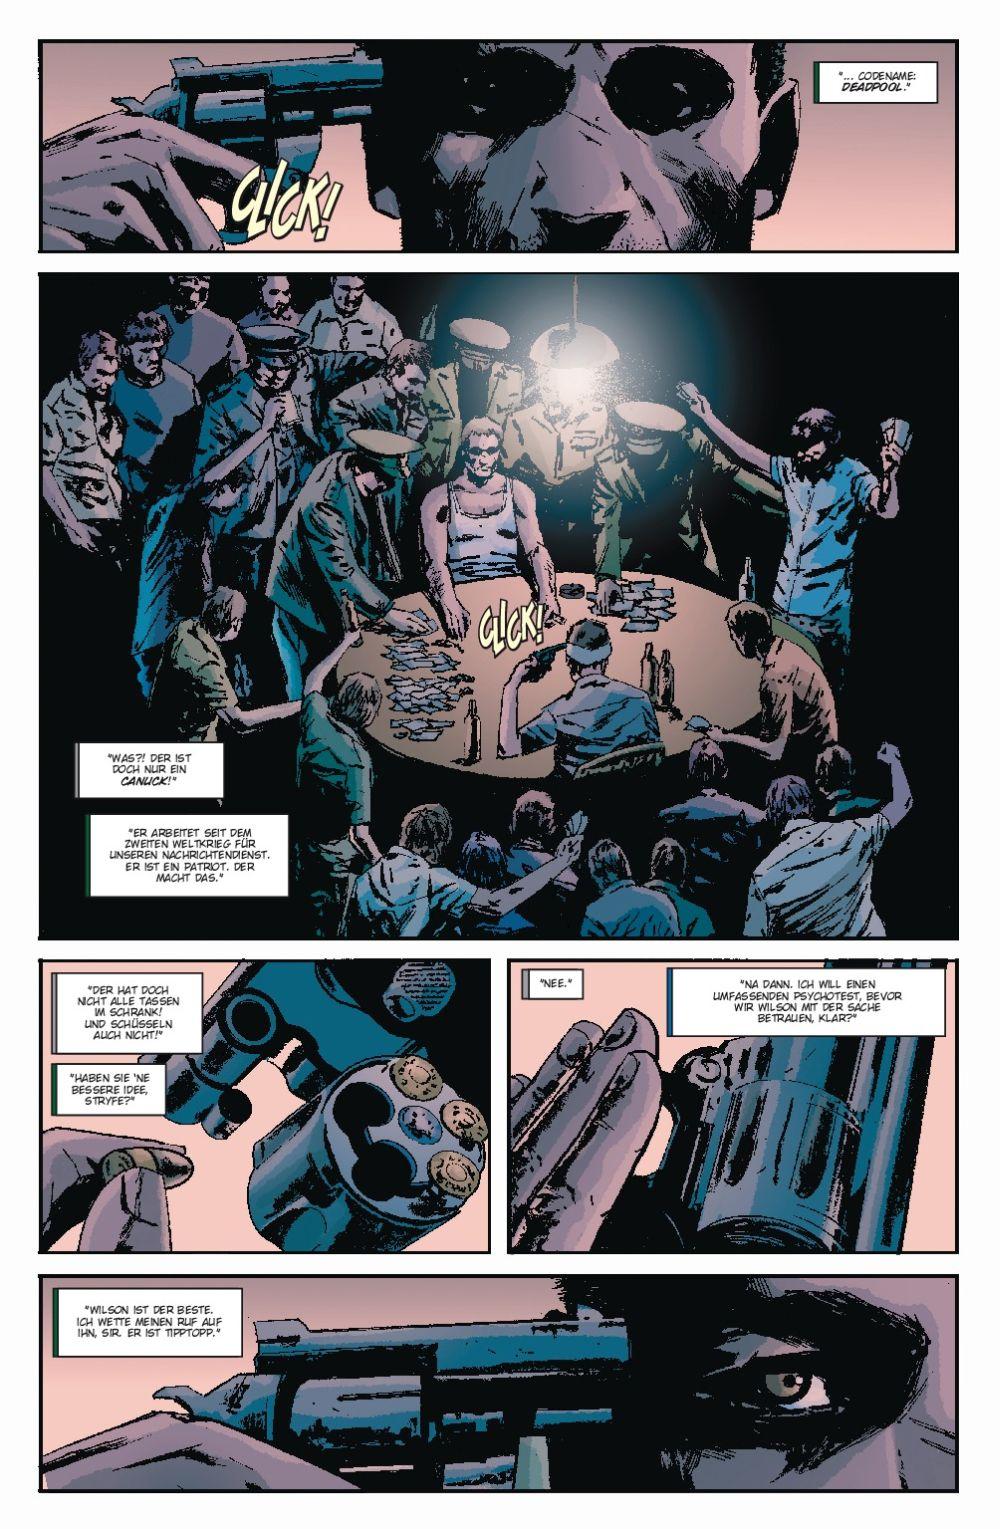 Marvel-Comic: DEADPOOL | PULP - Verlag: Panini-Verlag | Auszug aus dem Inhalt